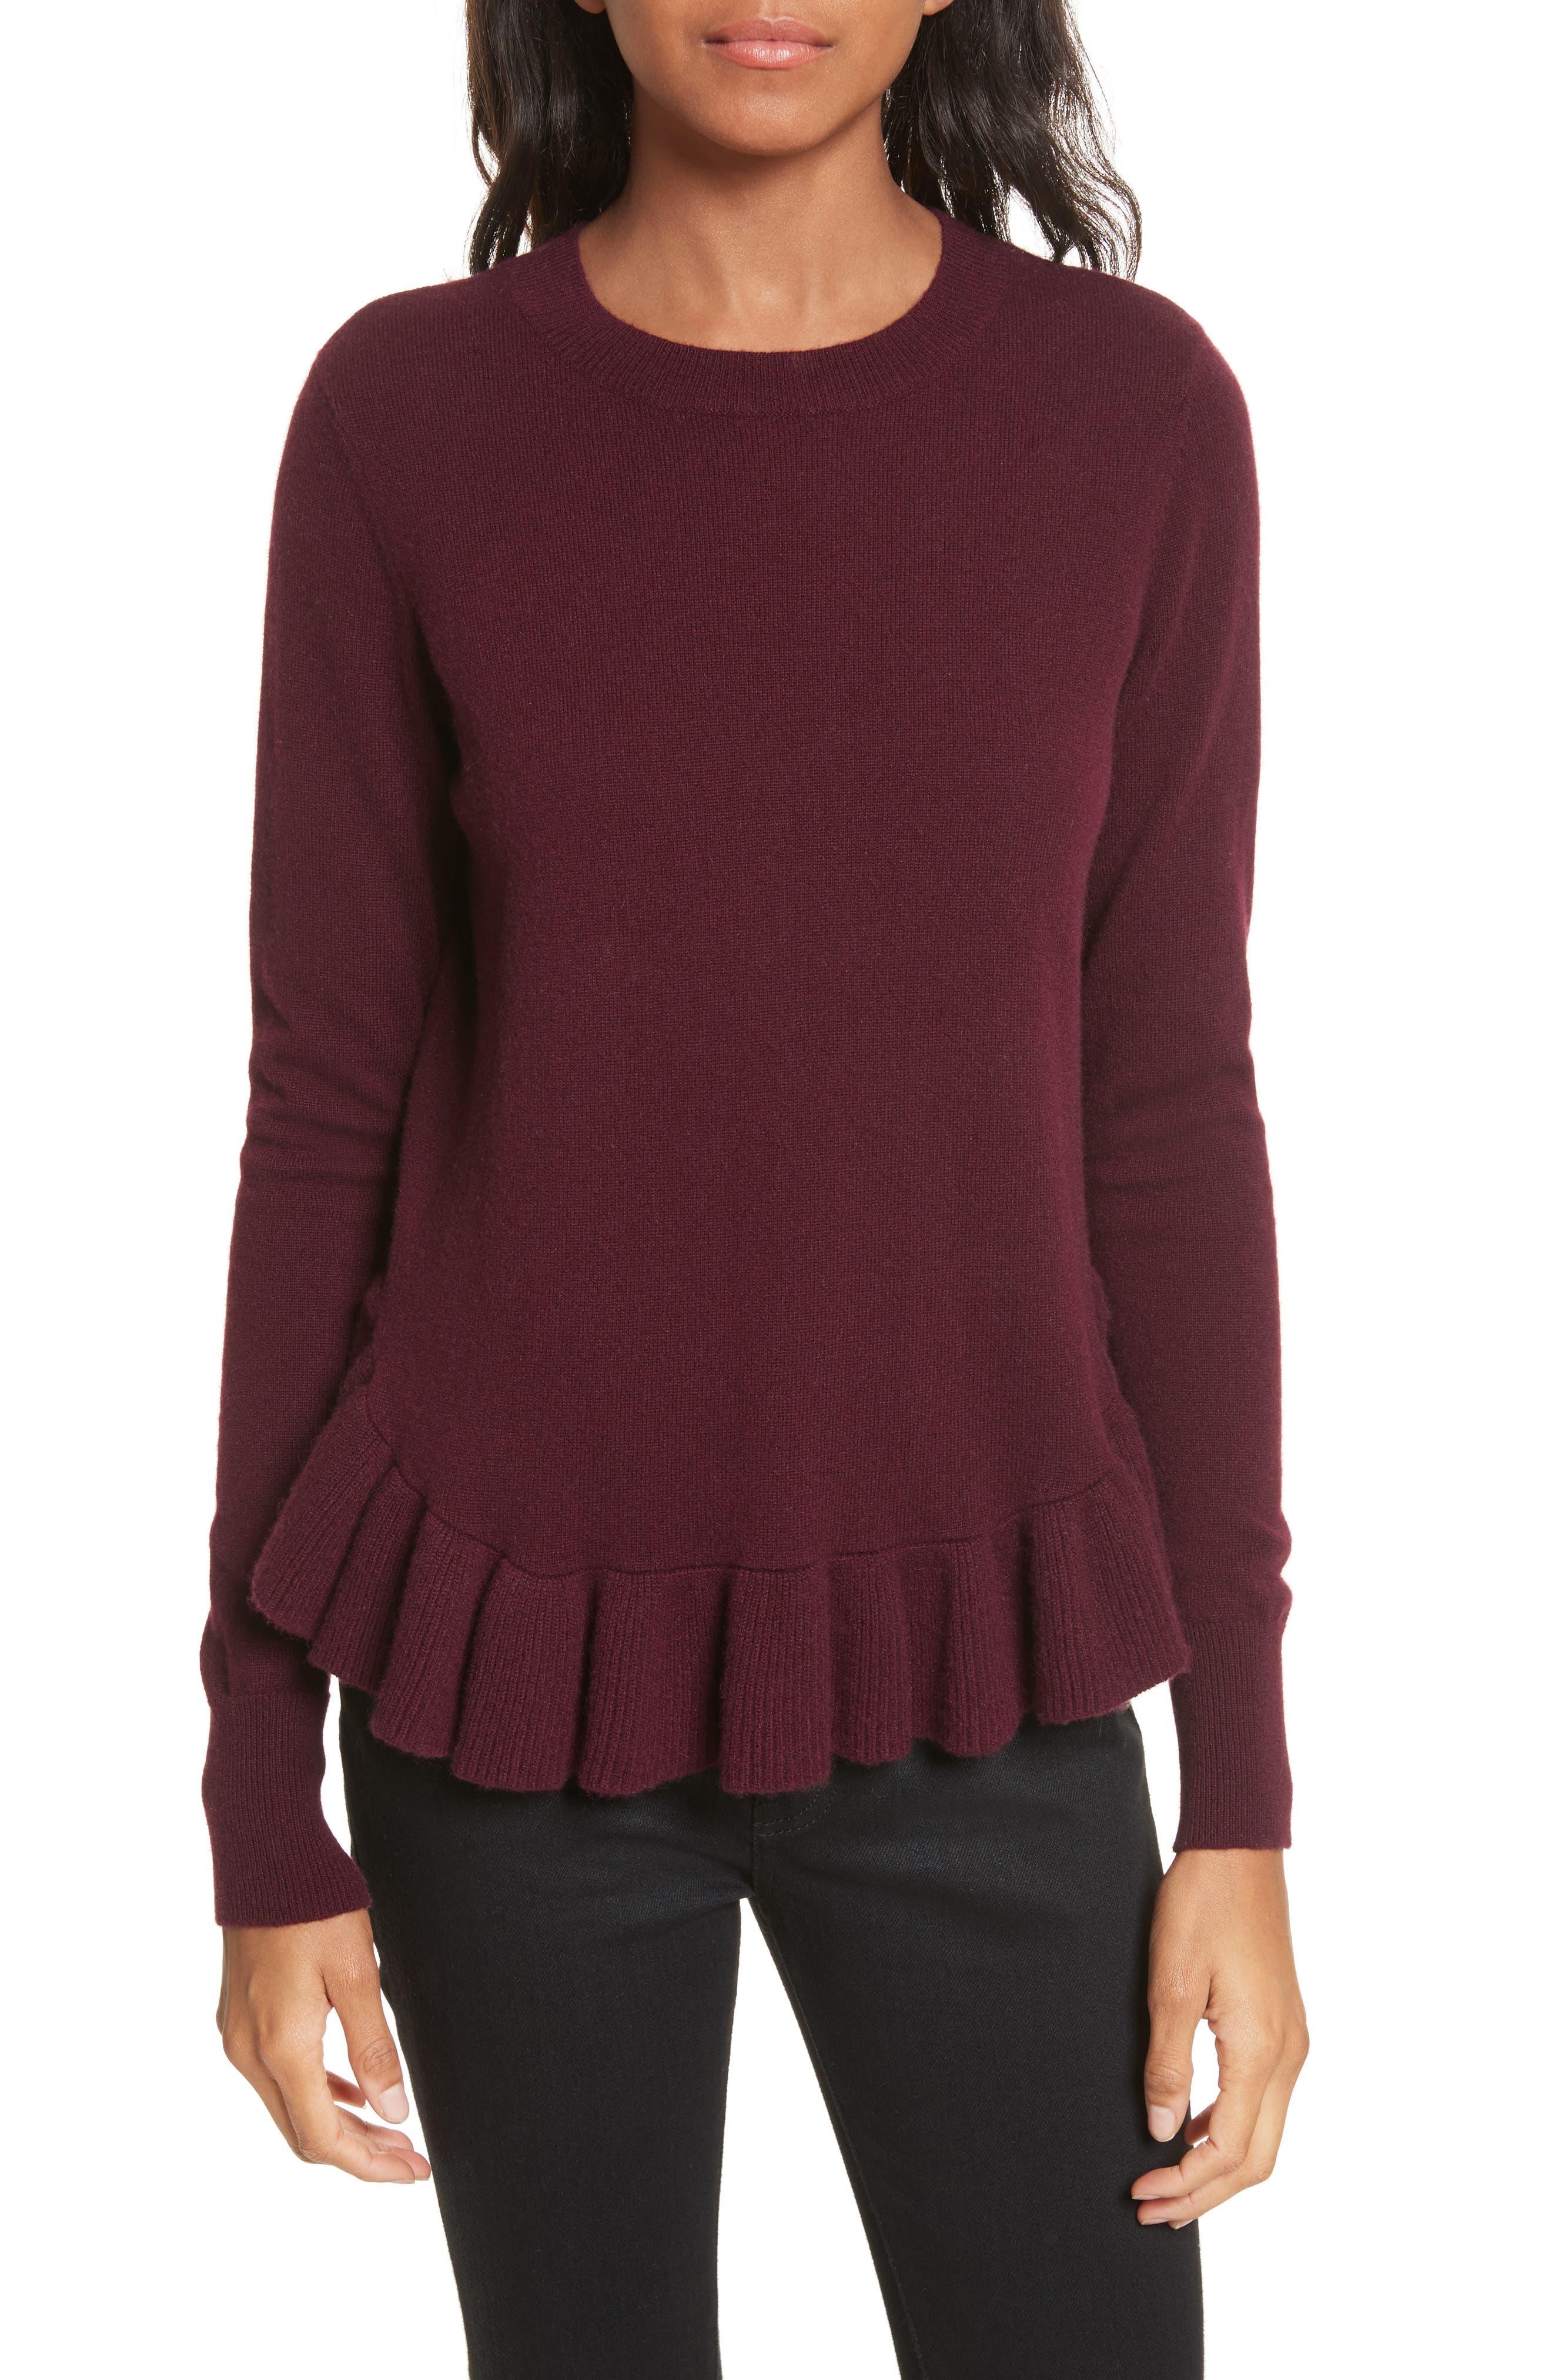 autumn cashmere Ruffle Hem Crewneck Sweater